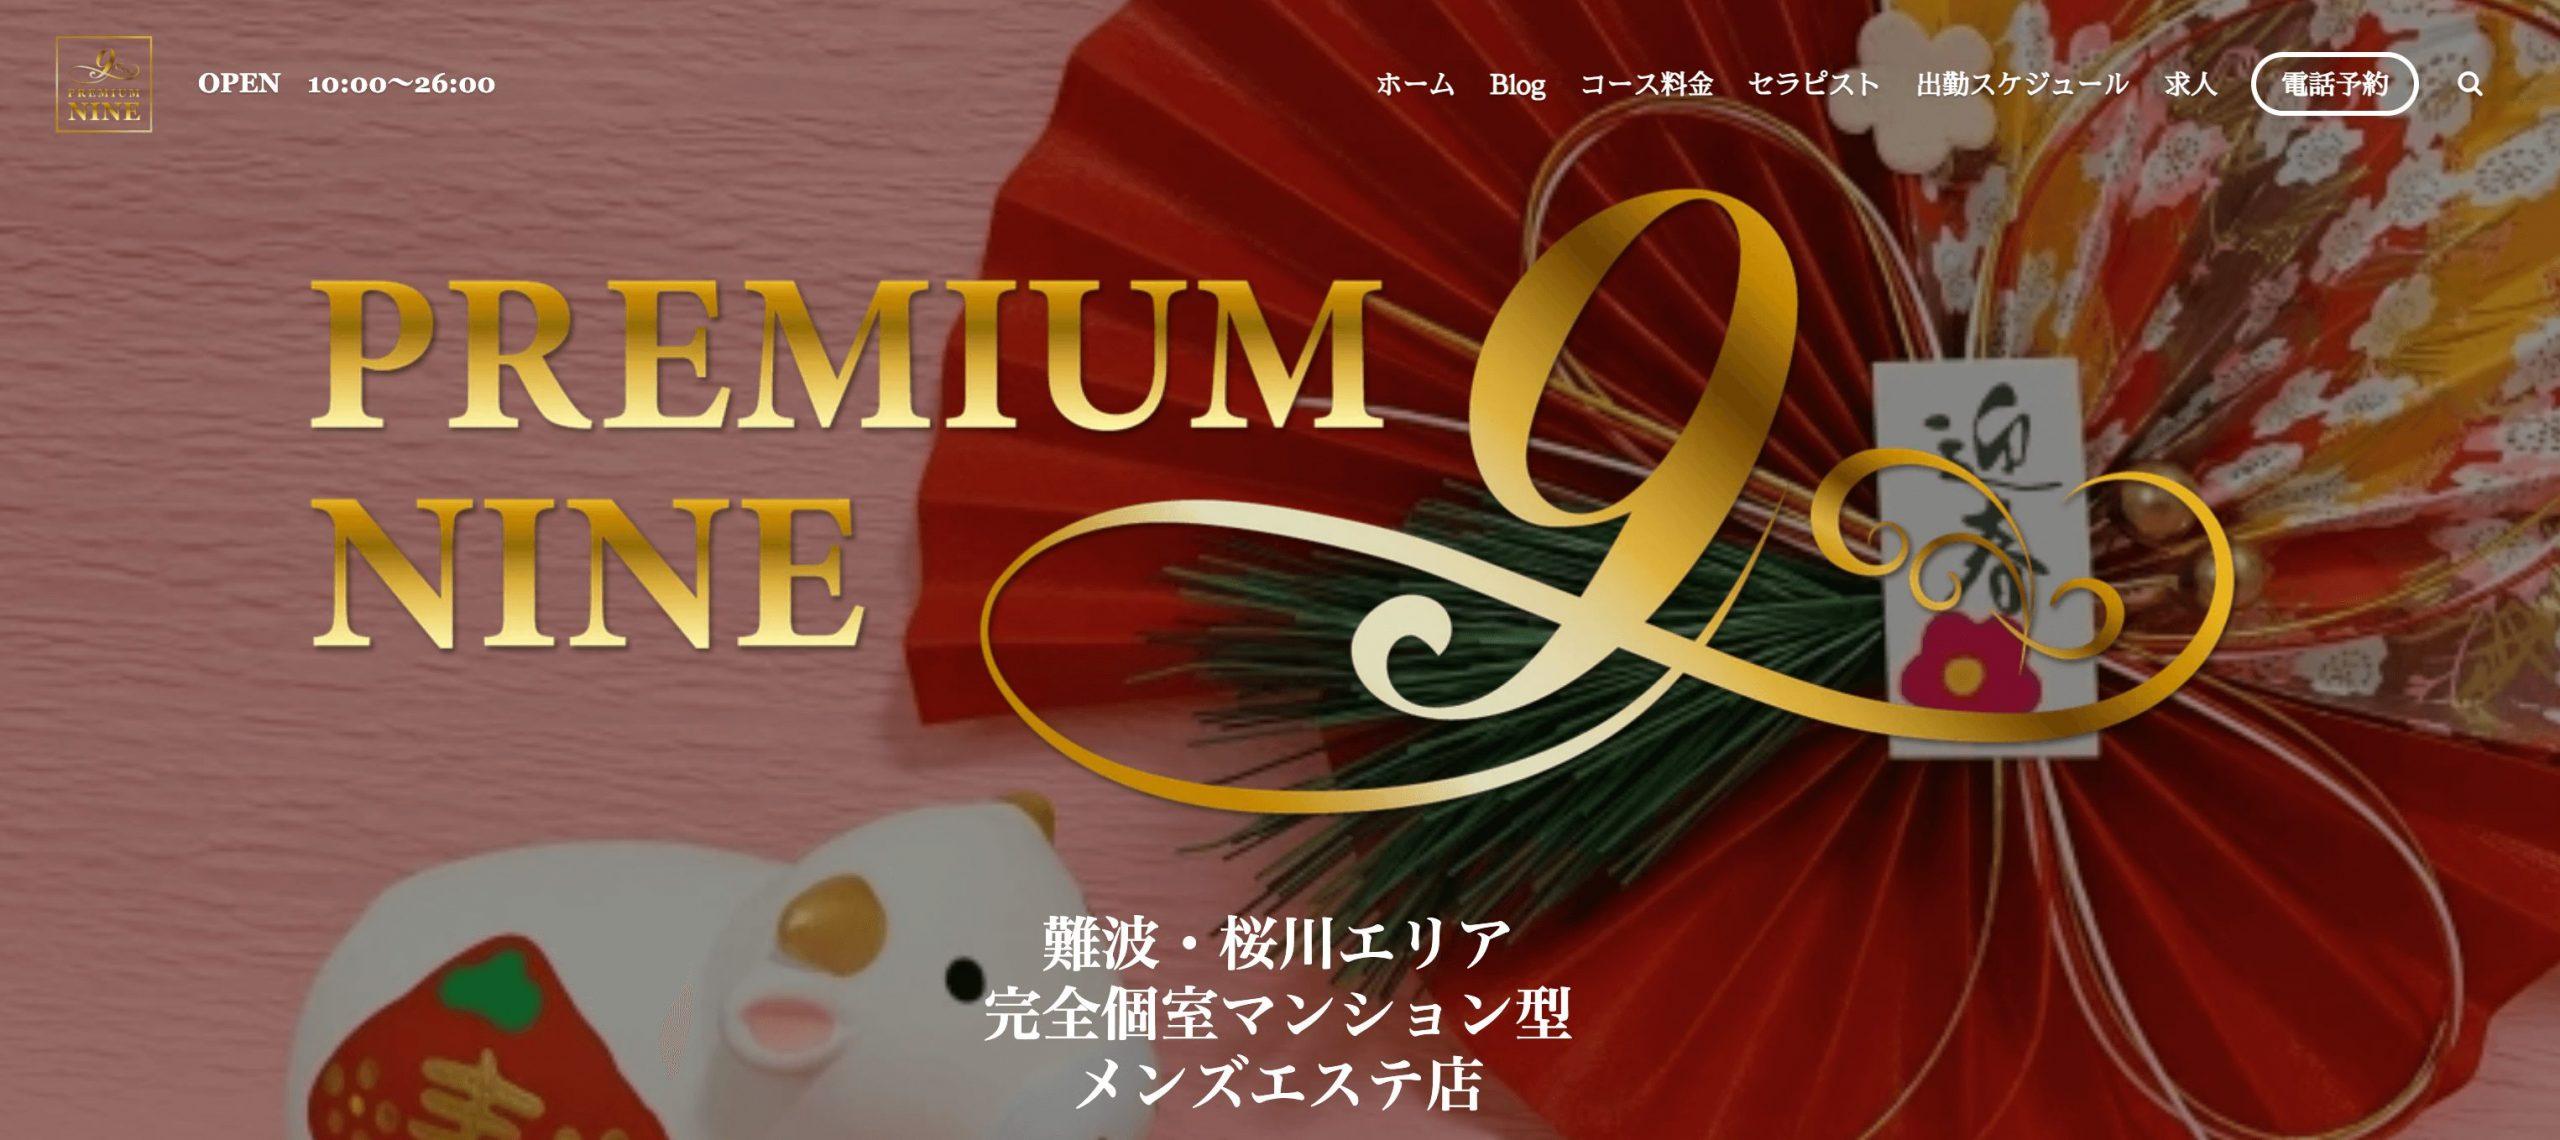 PREMIUM NINE(プレミアムナイン)